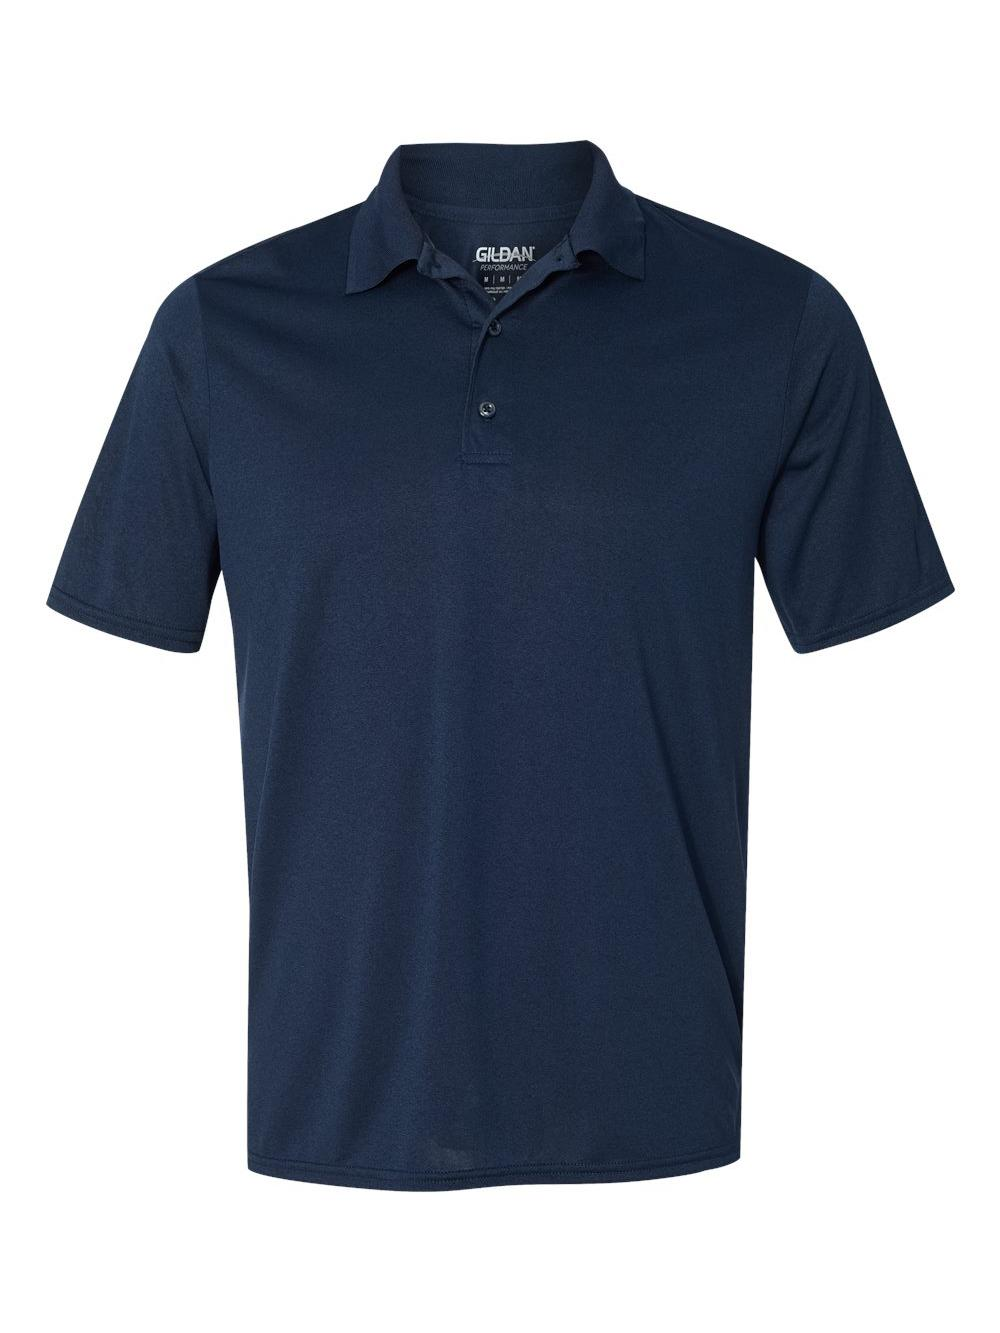 Gildan-Performance-Jersey-Sport-Shirt-44800 thumbnail 15